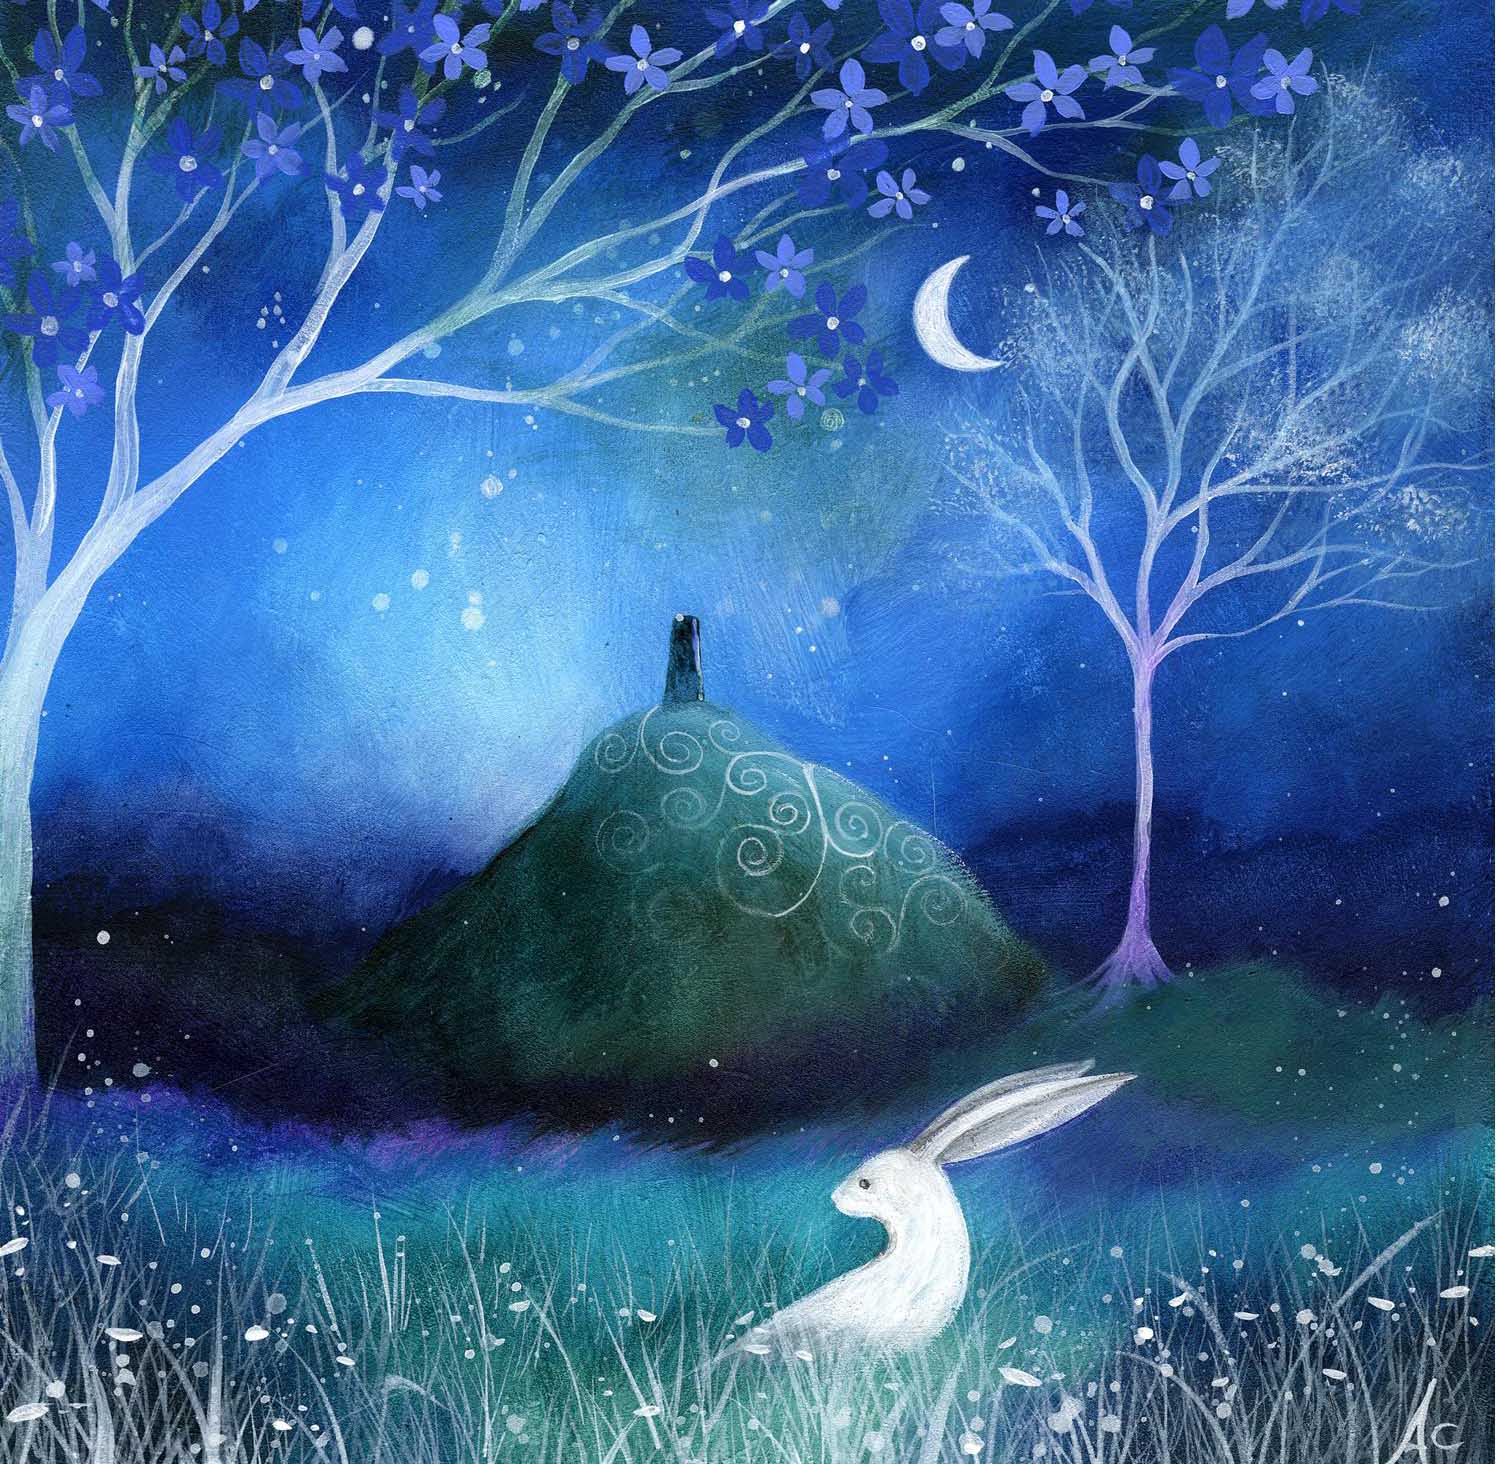 Earth Angels Art. Art and Illustrations by Amanda Clark ... - photo#44